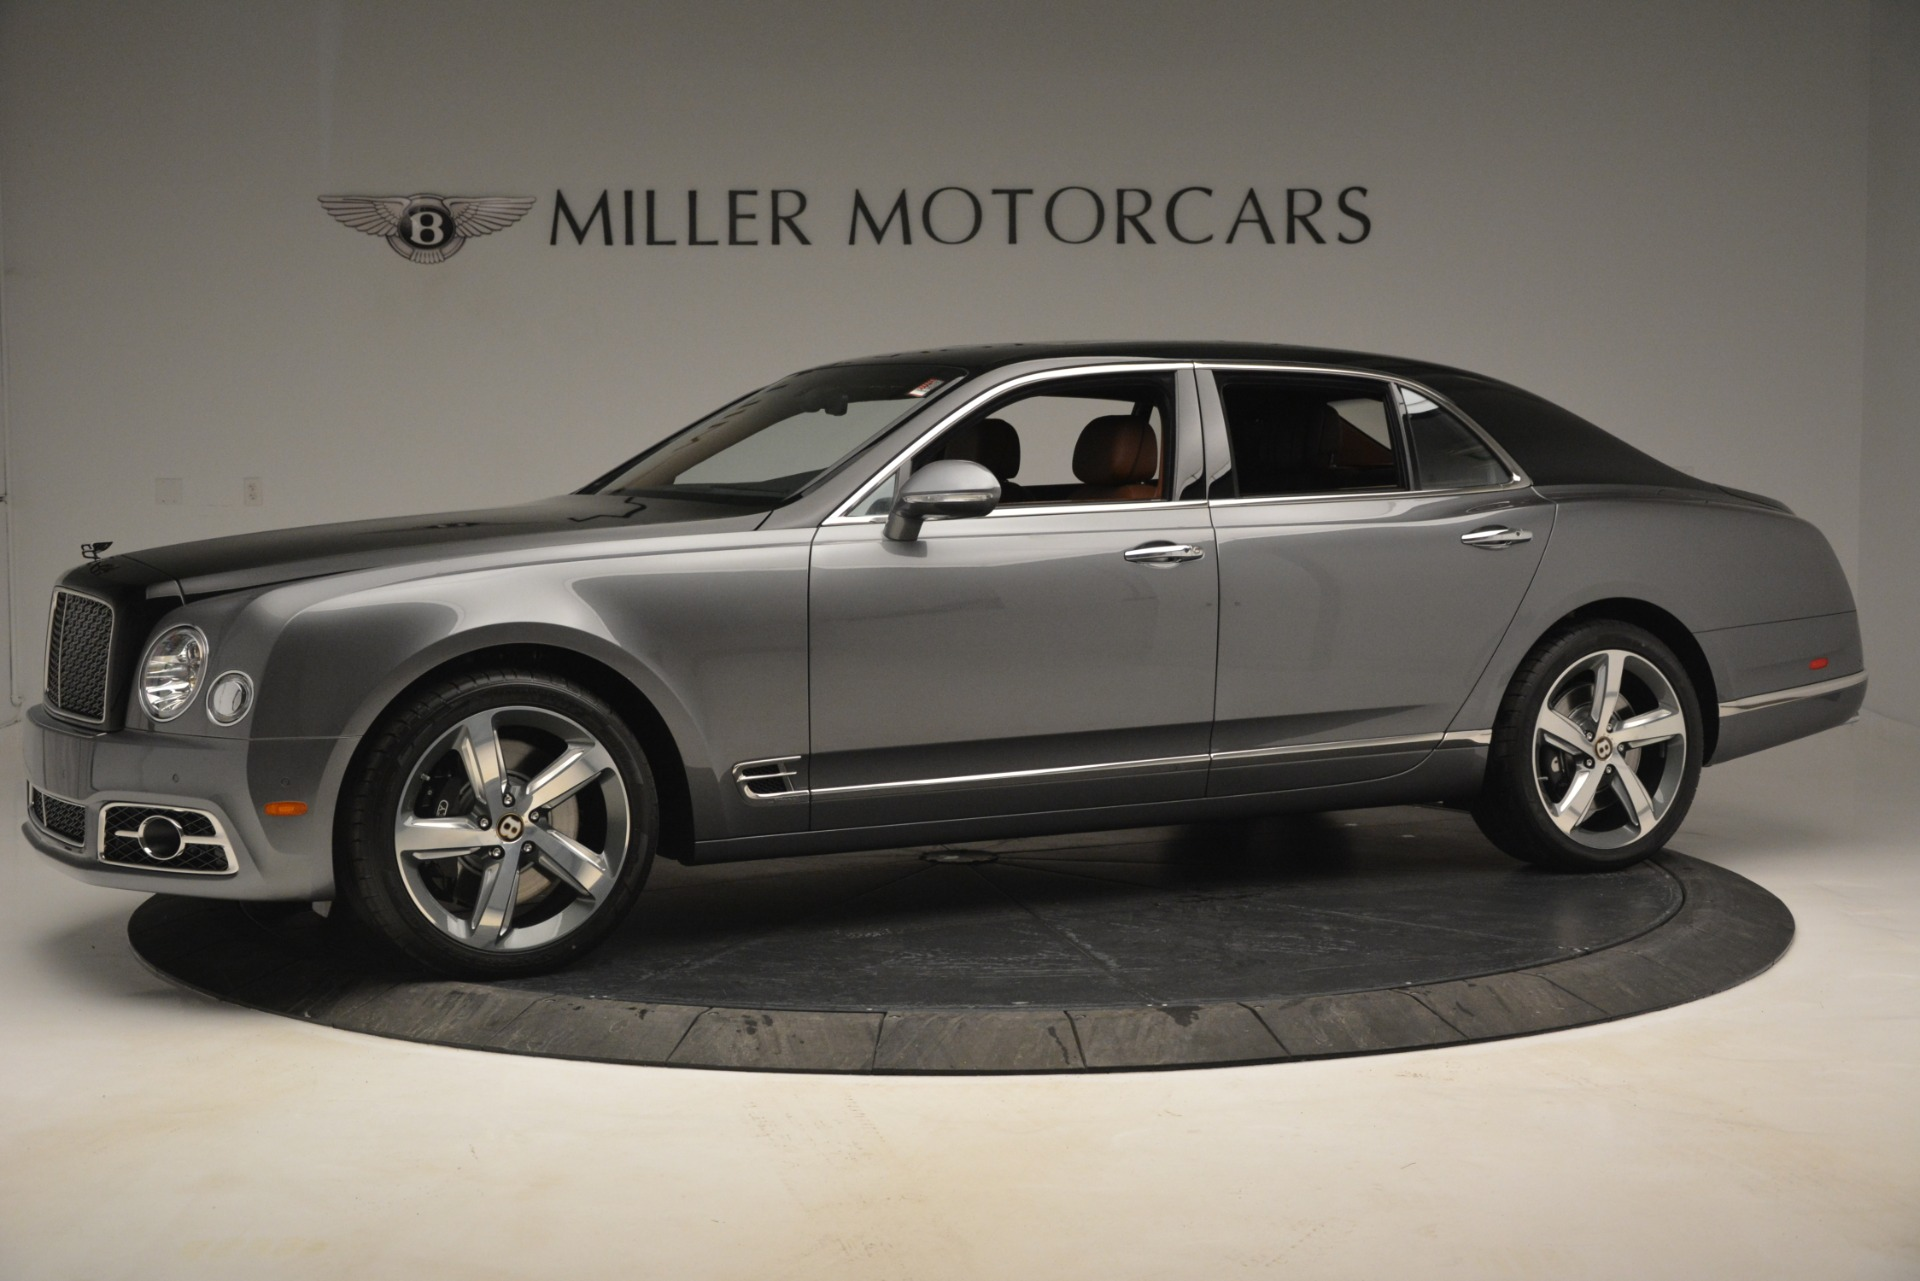 New 2019 Bentley Mulsanne Speed For Sale In Greenwich, CT 2786_p2